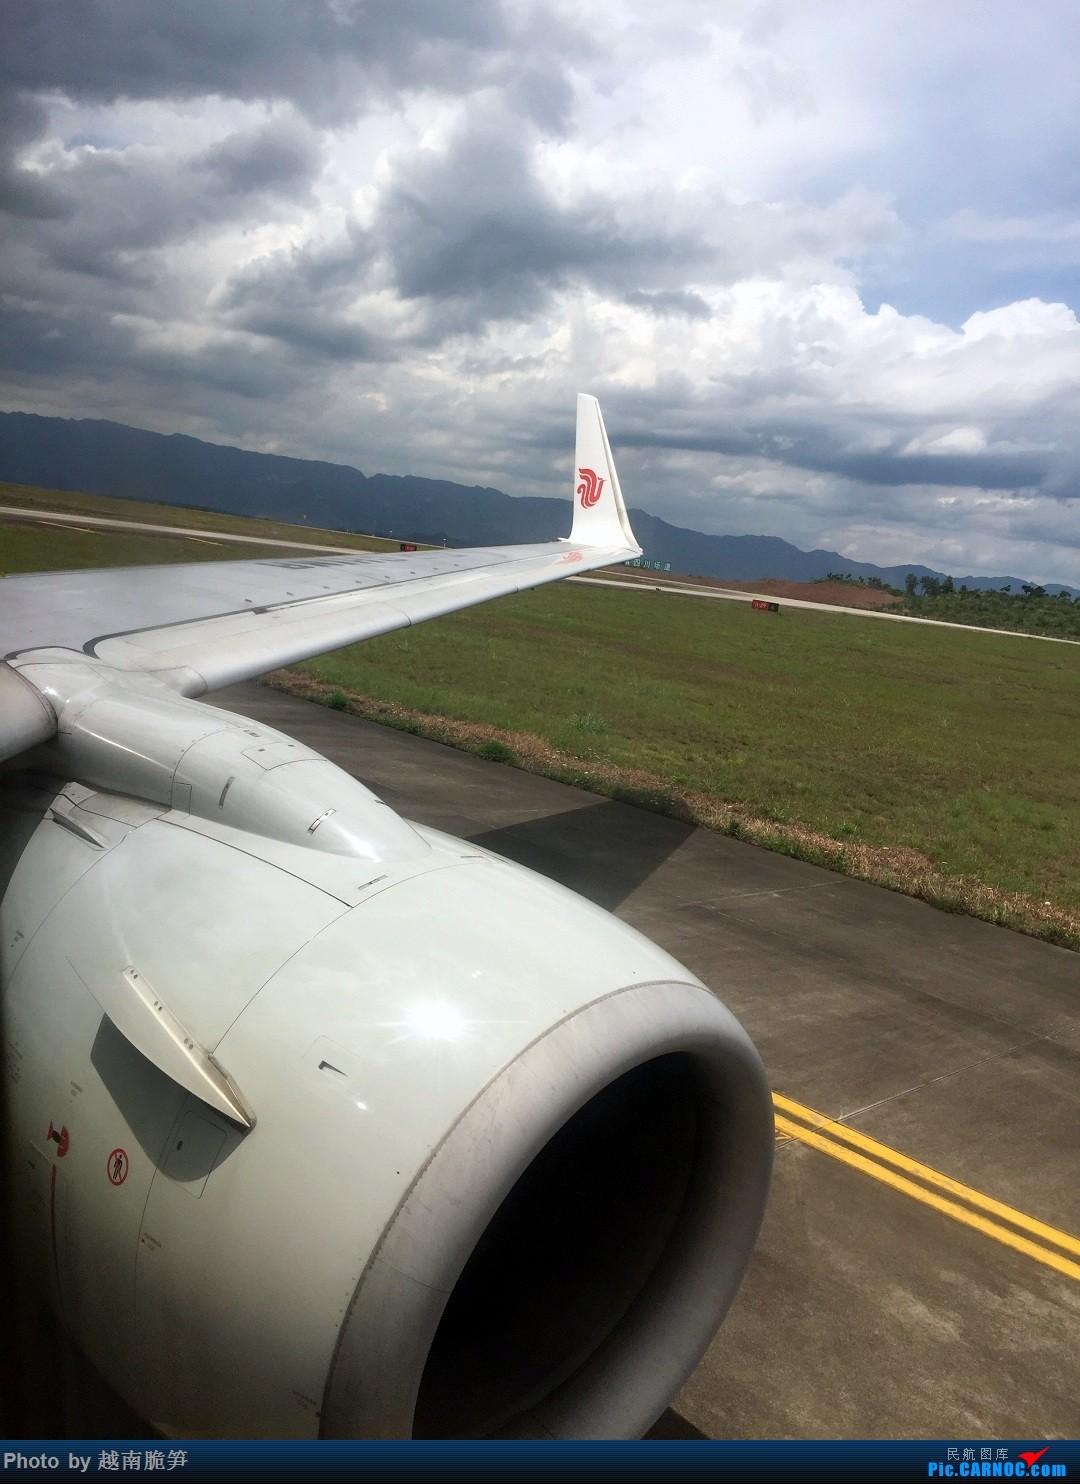 Re:[原创]重庆第二大机场万州,去过地势最险峻的机场 BOEING 737-800